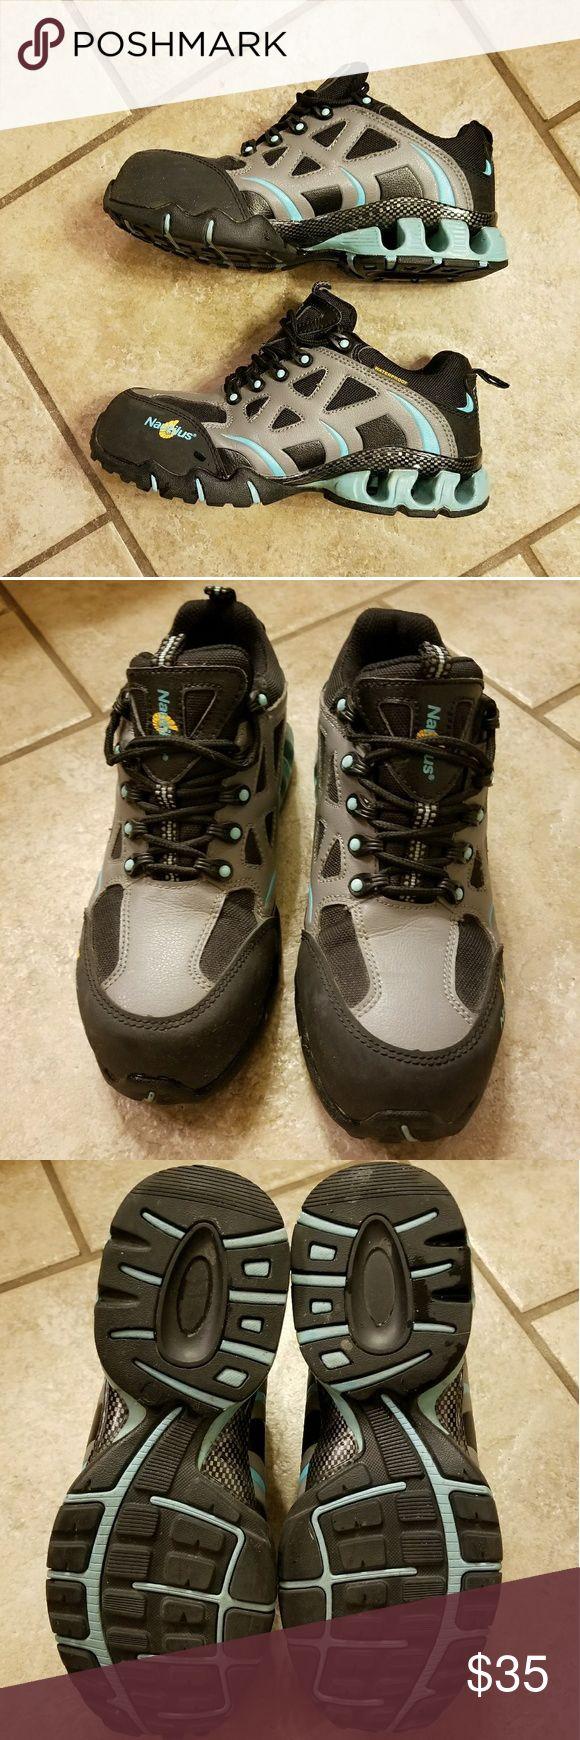 Nautilus safety steel toe shoes Worn twice. Comfortable steel toe shoe women's size 8. Nautilus Shoes